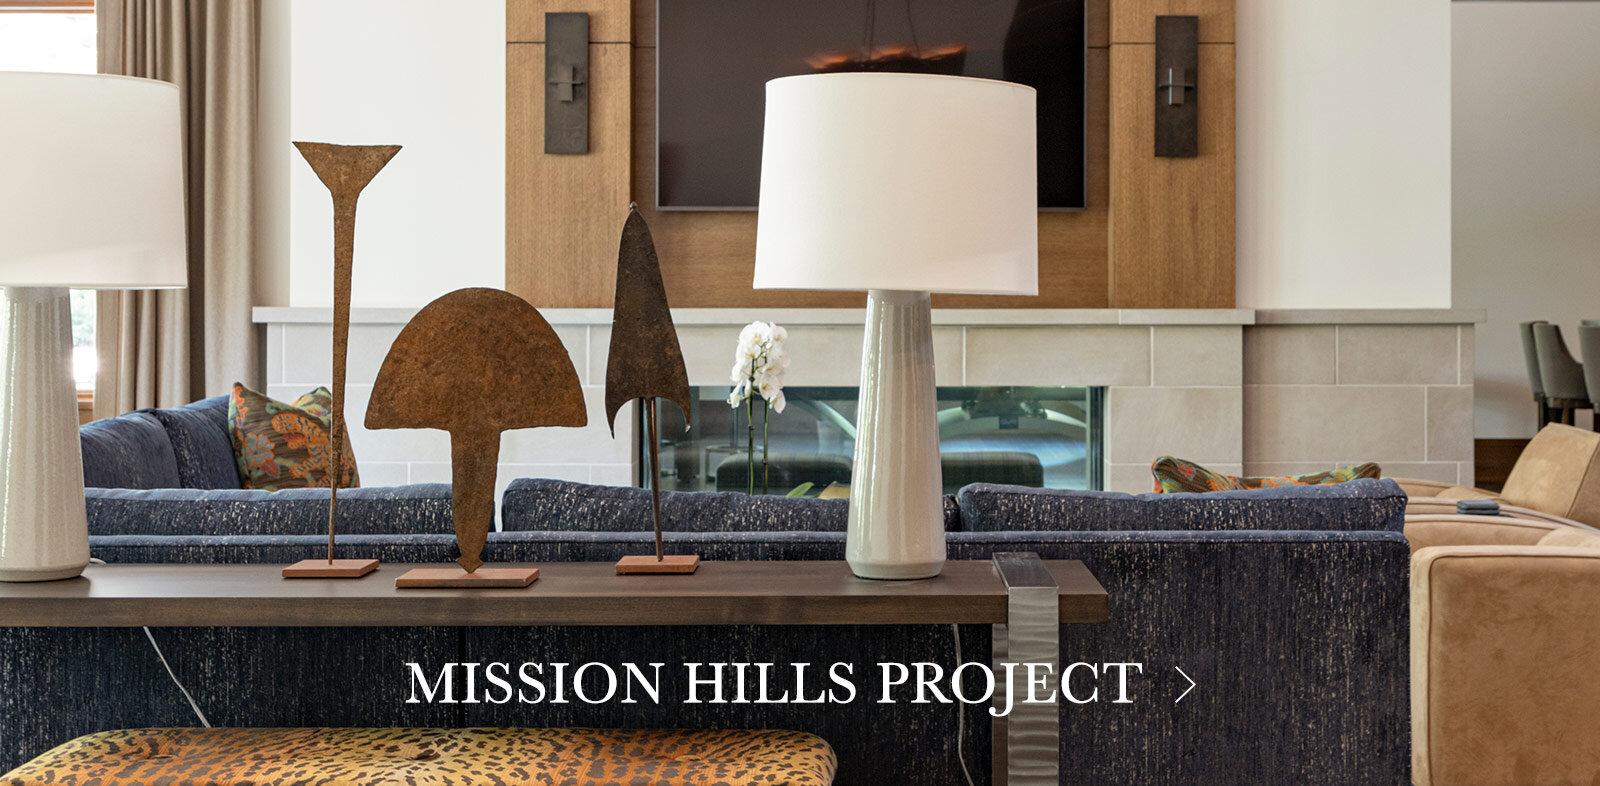 MISSION-HILLS-PROJECT.jpg